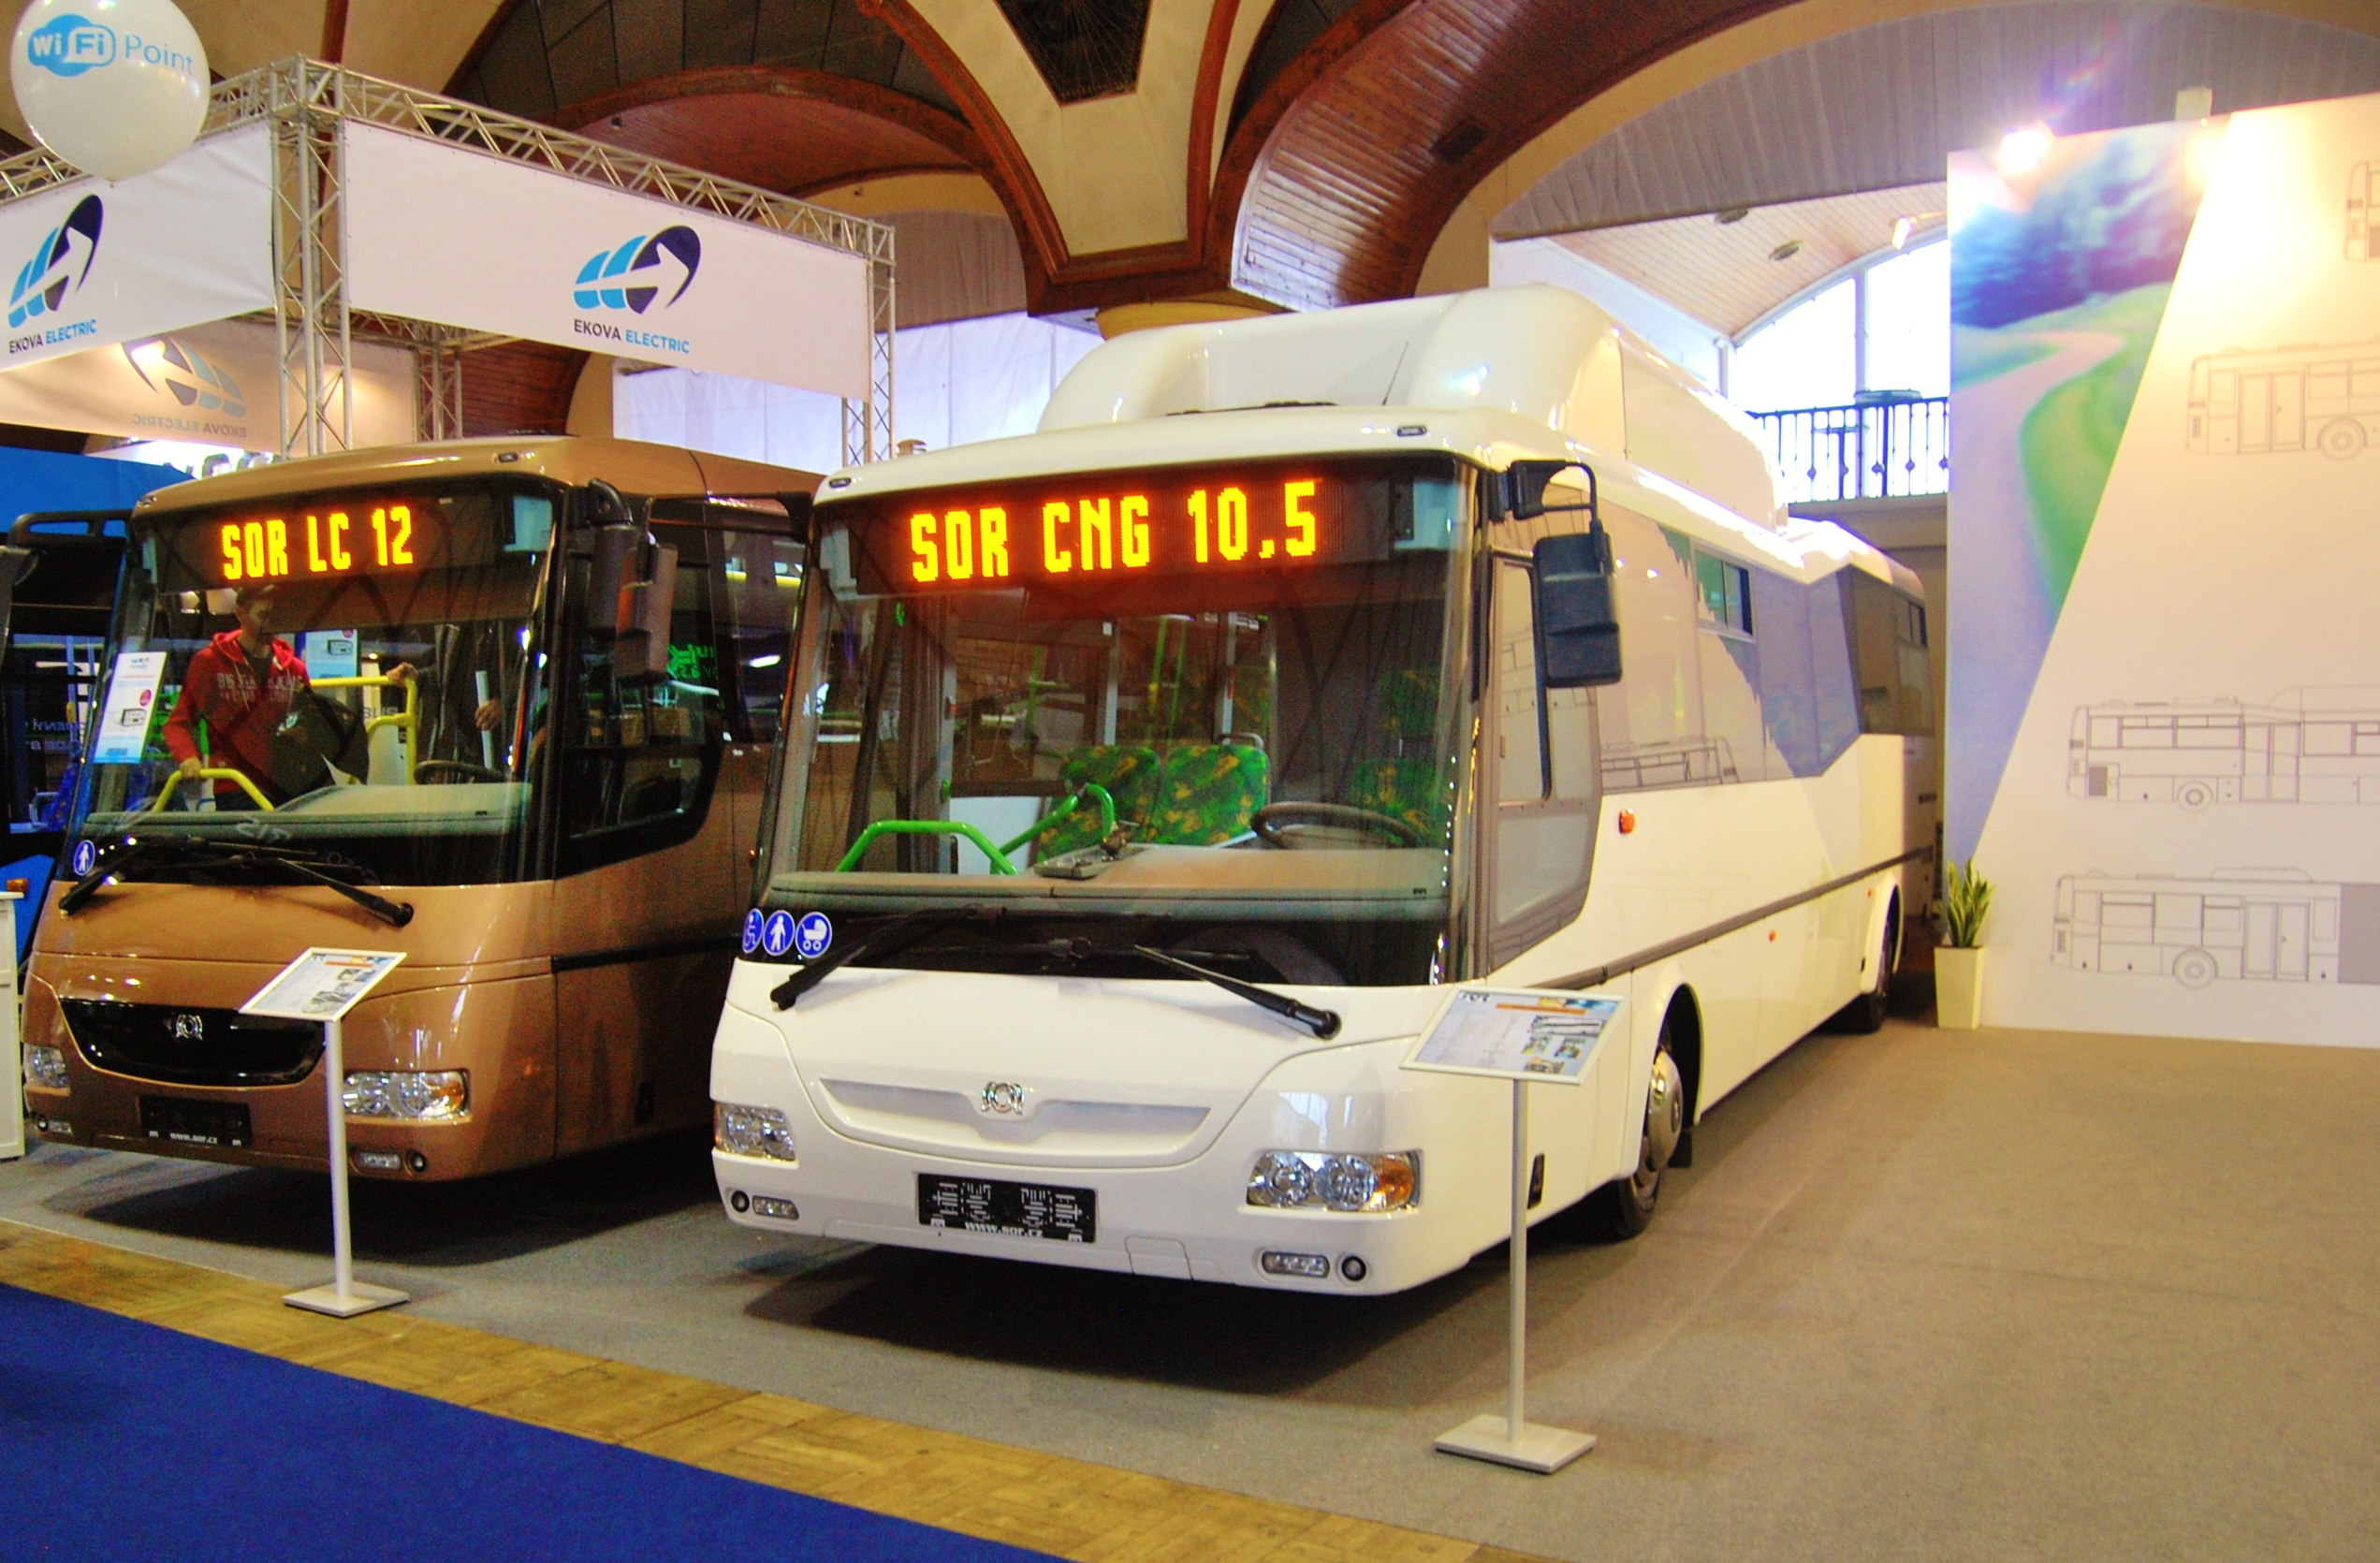 SOR - Czechbus 2015 1